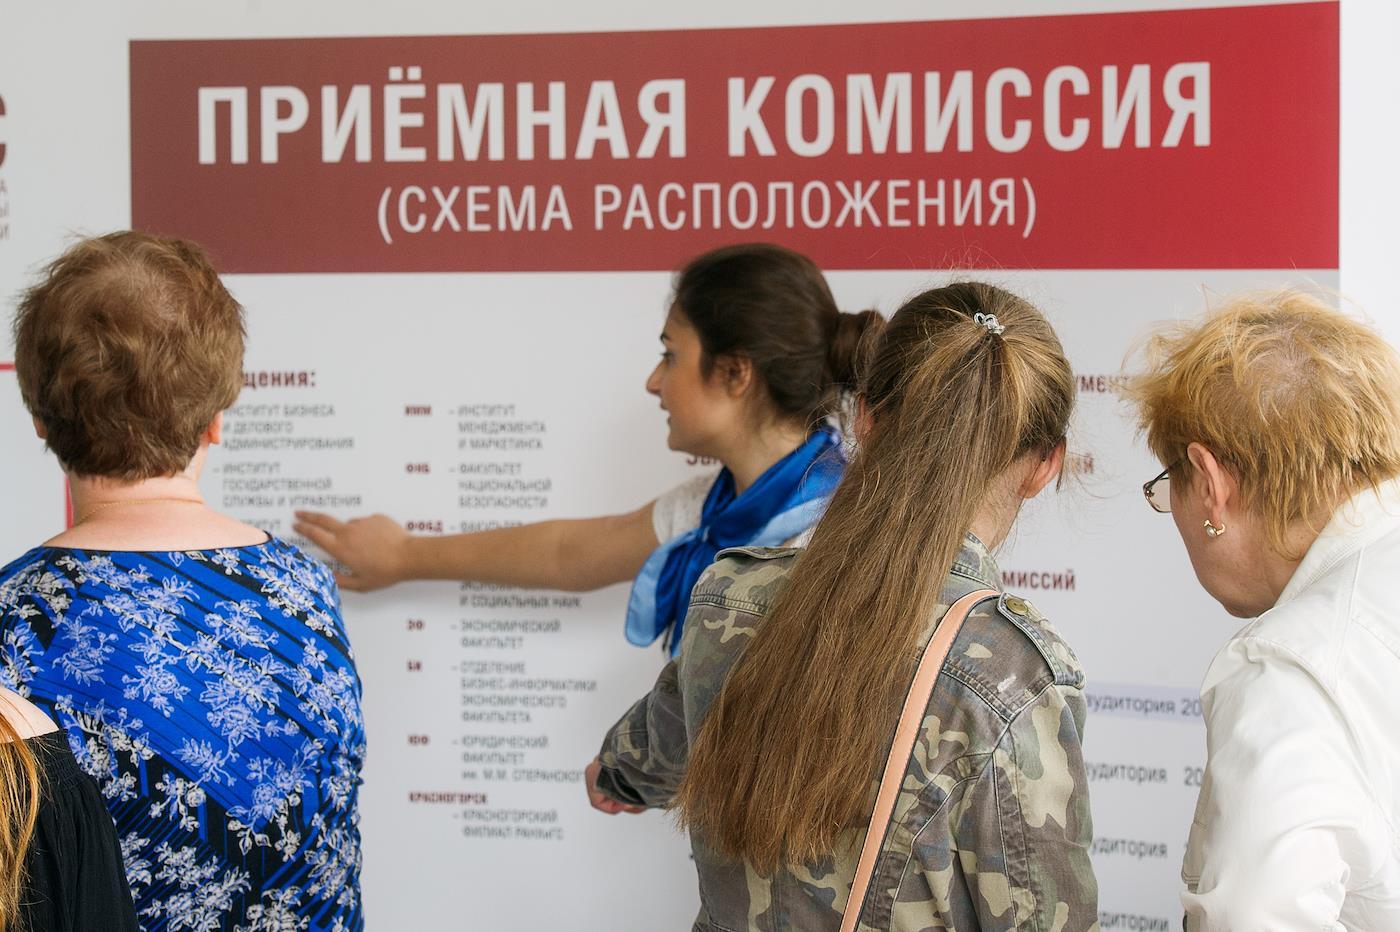 автор фото Евгений Гурко/Коммерсантъ